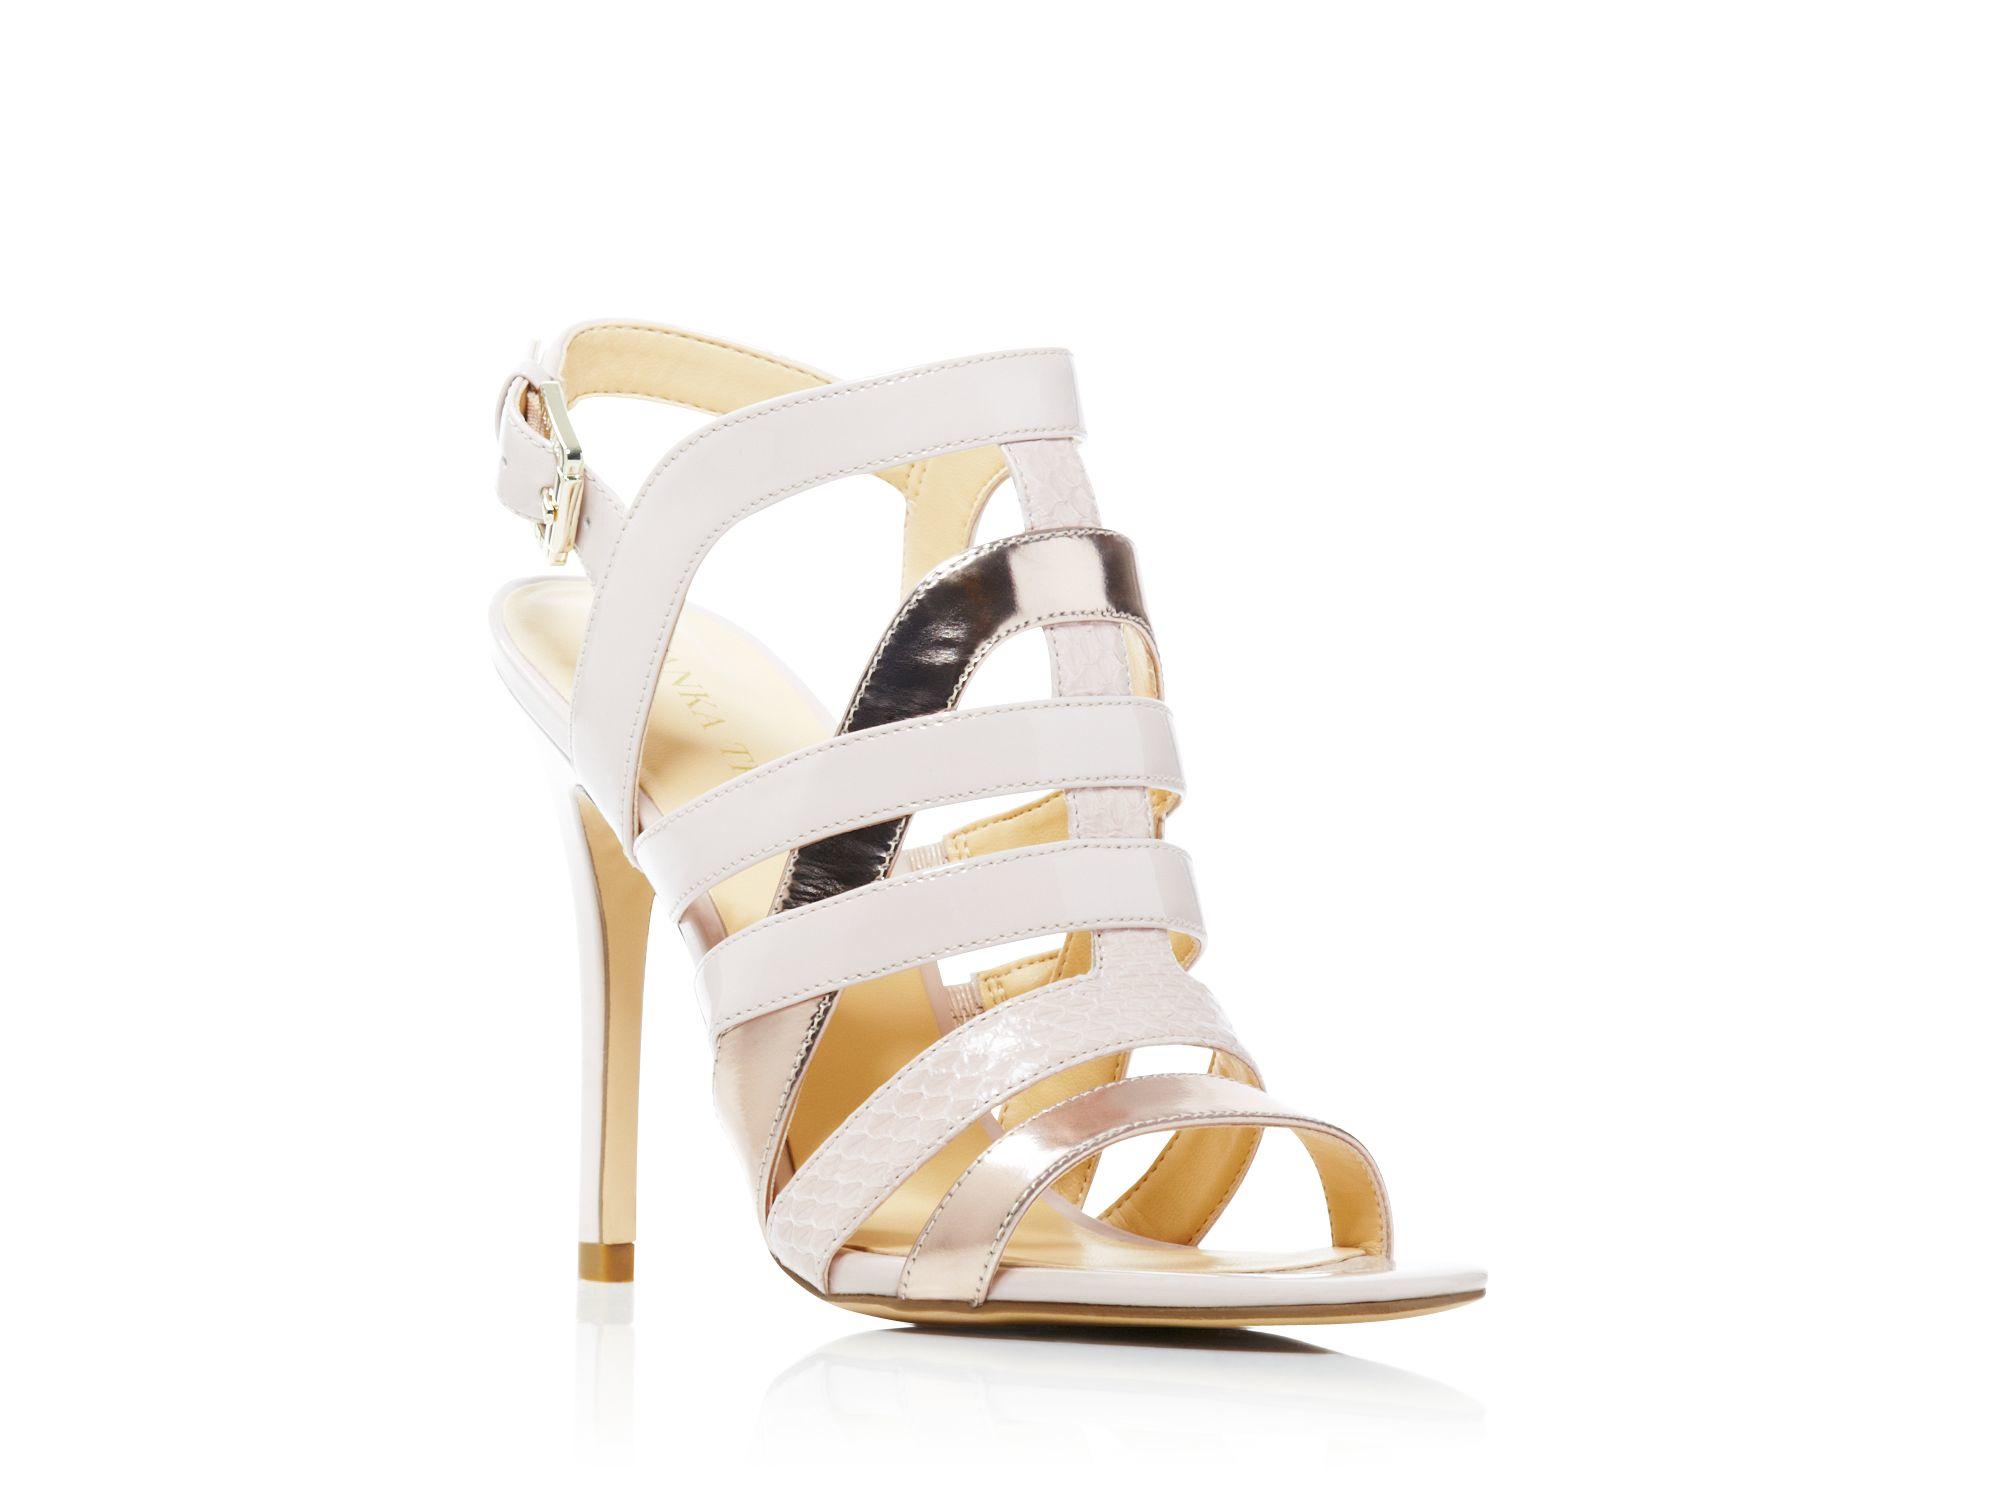 Lyst Ivanka Trump Strappy Sandals High Heel in Pink